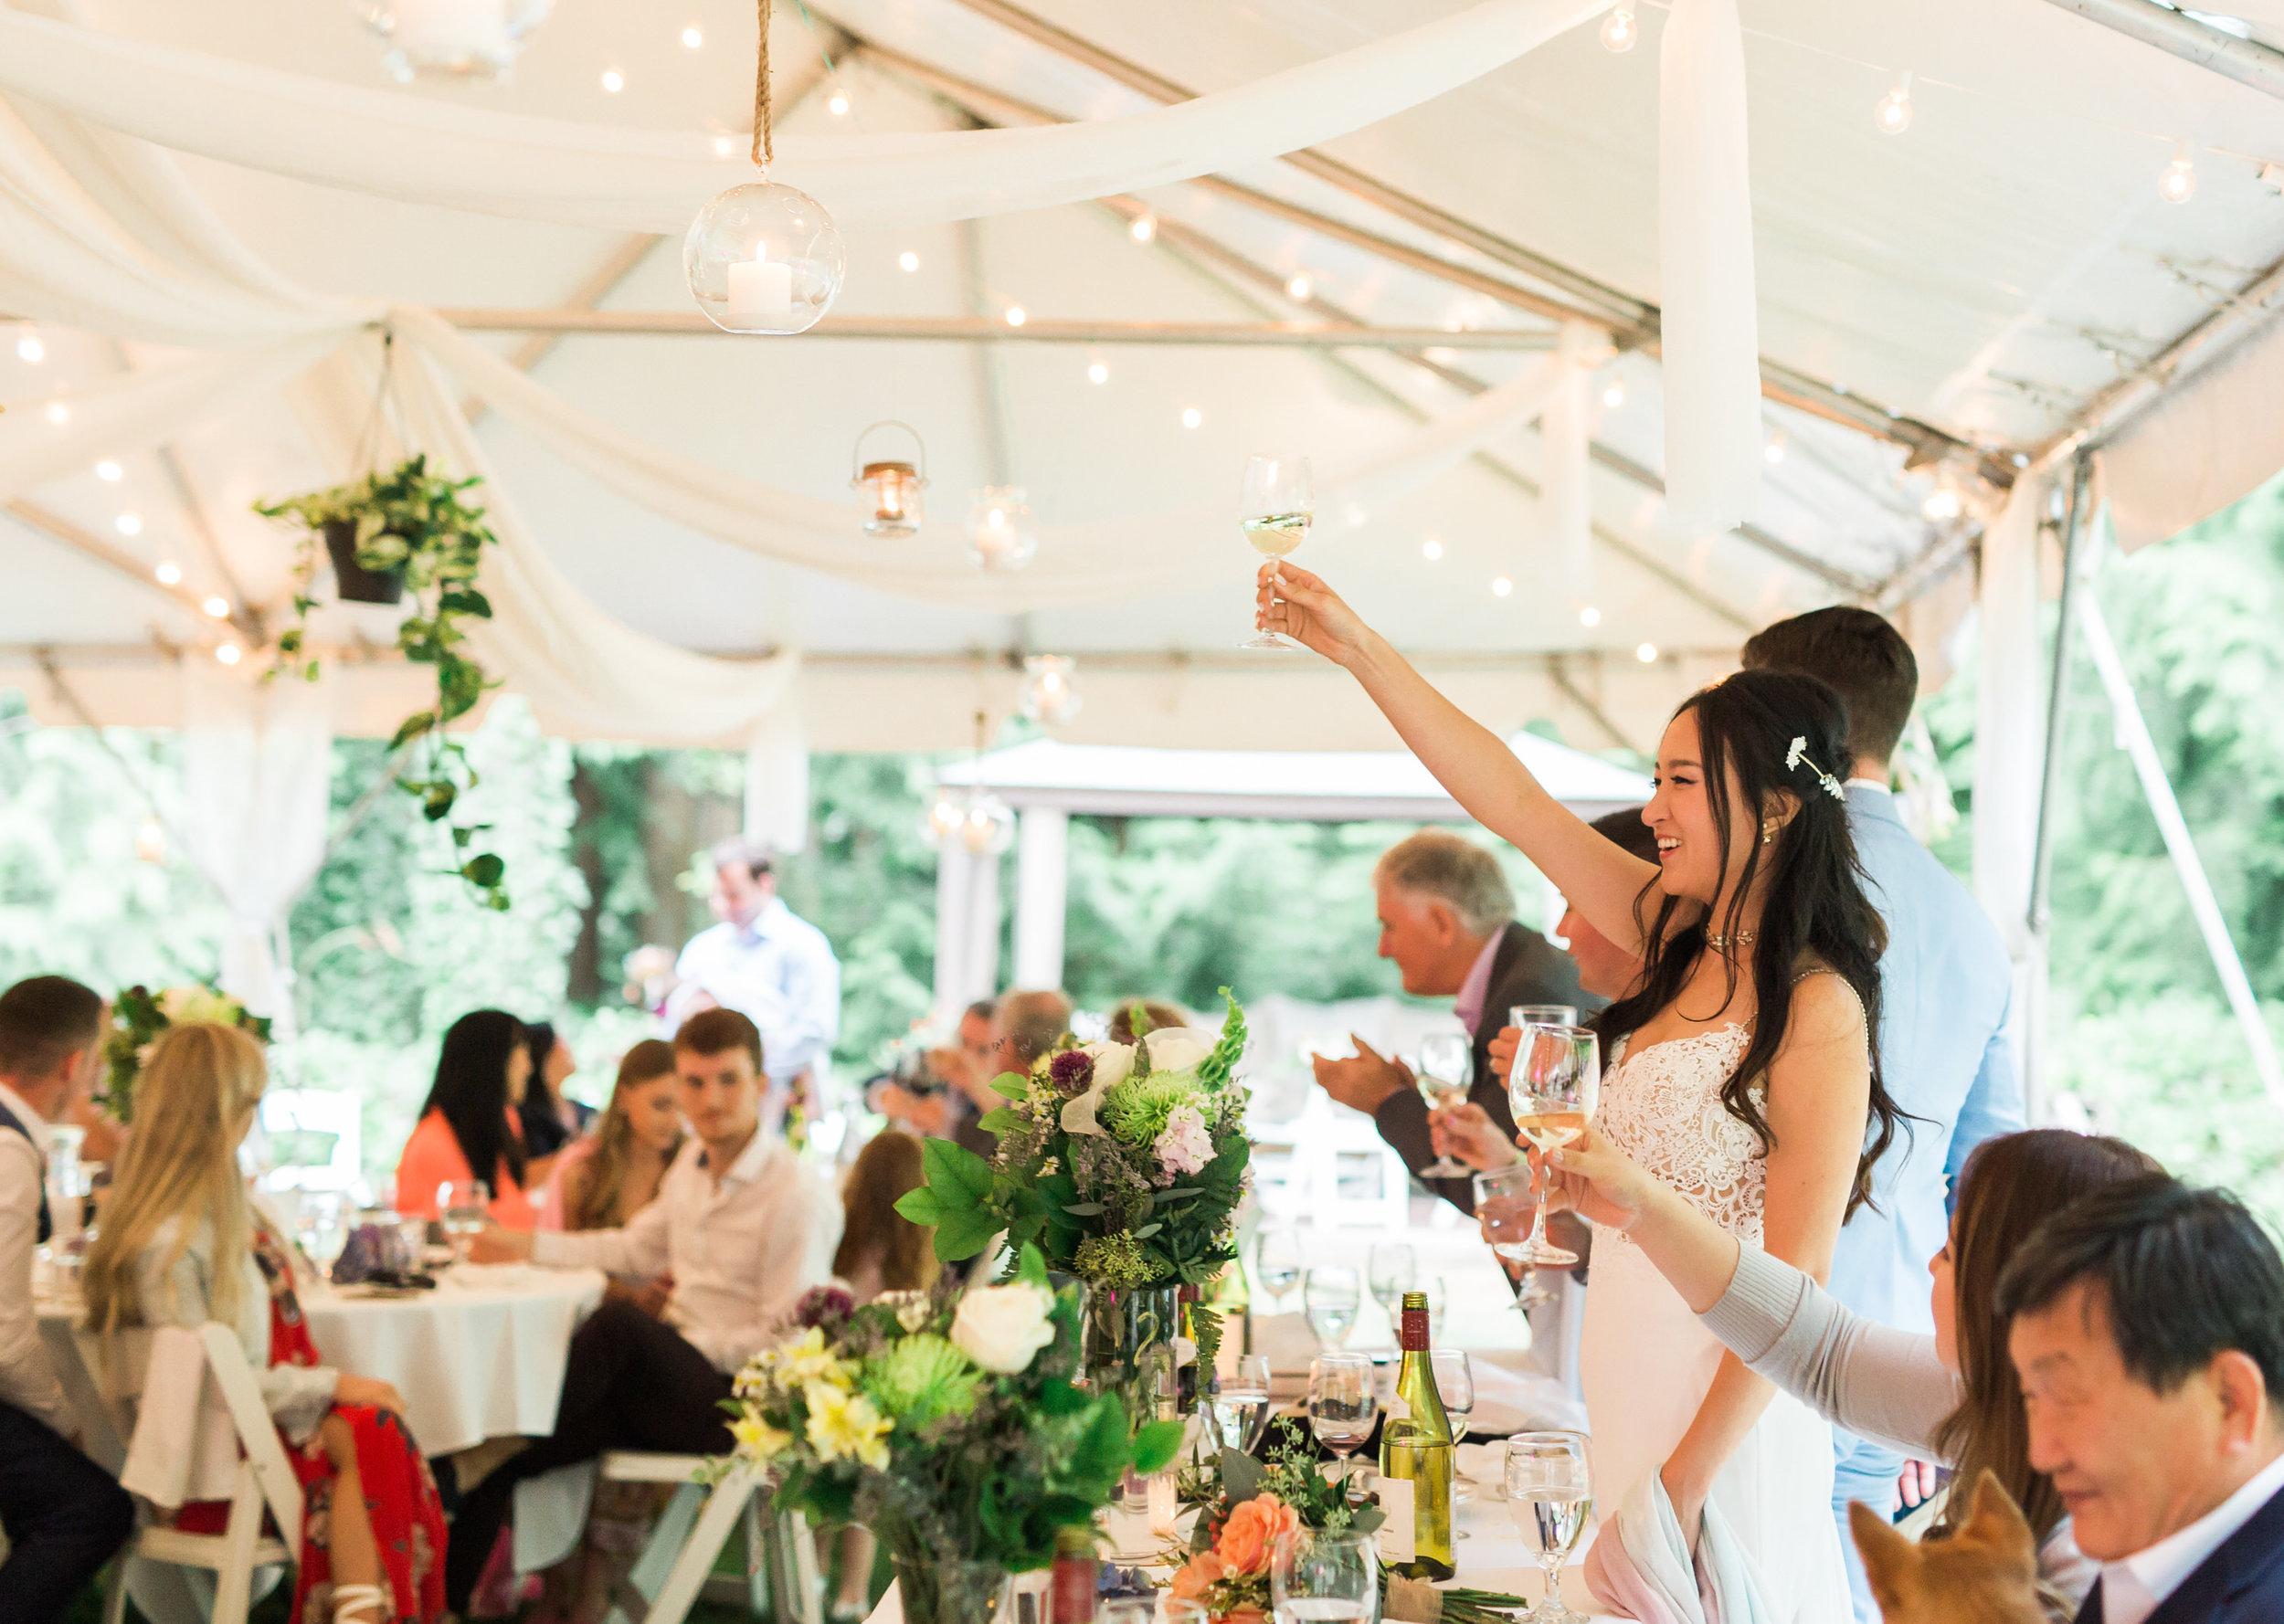 Linwood House Wedding Photos - Roberts Creek Wedding Photos - Vancouver Wedding Photographer & Videographer - Sunshine Coast Wedding Photos - Sunshine Coast Wedding Photographer - Jennifer Picard Photography - IMG_9114.jpg